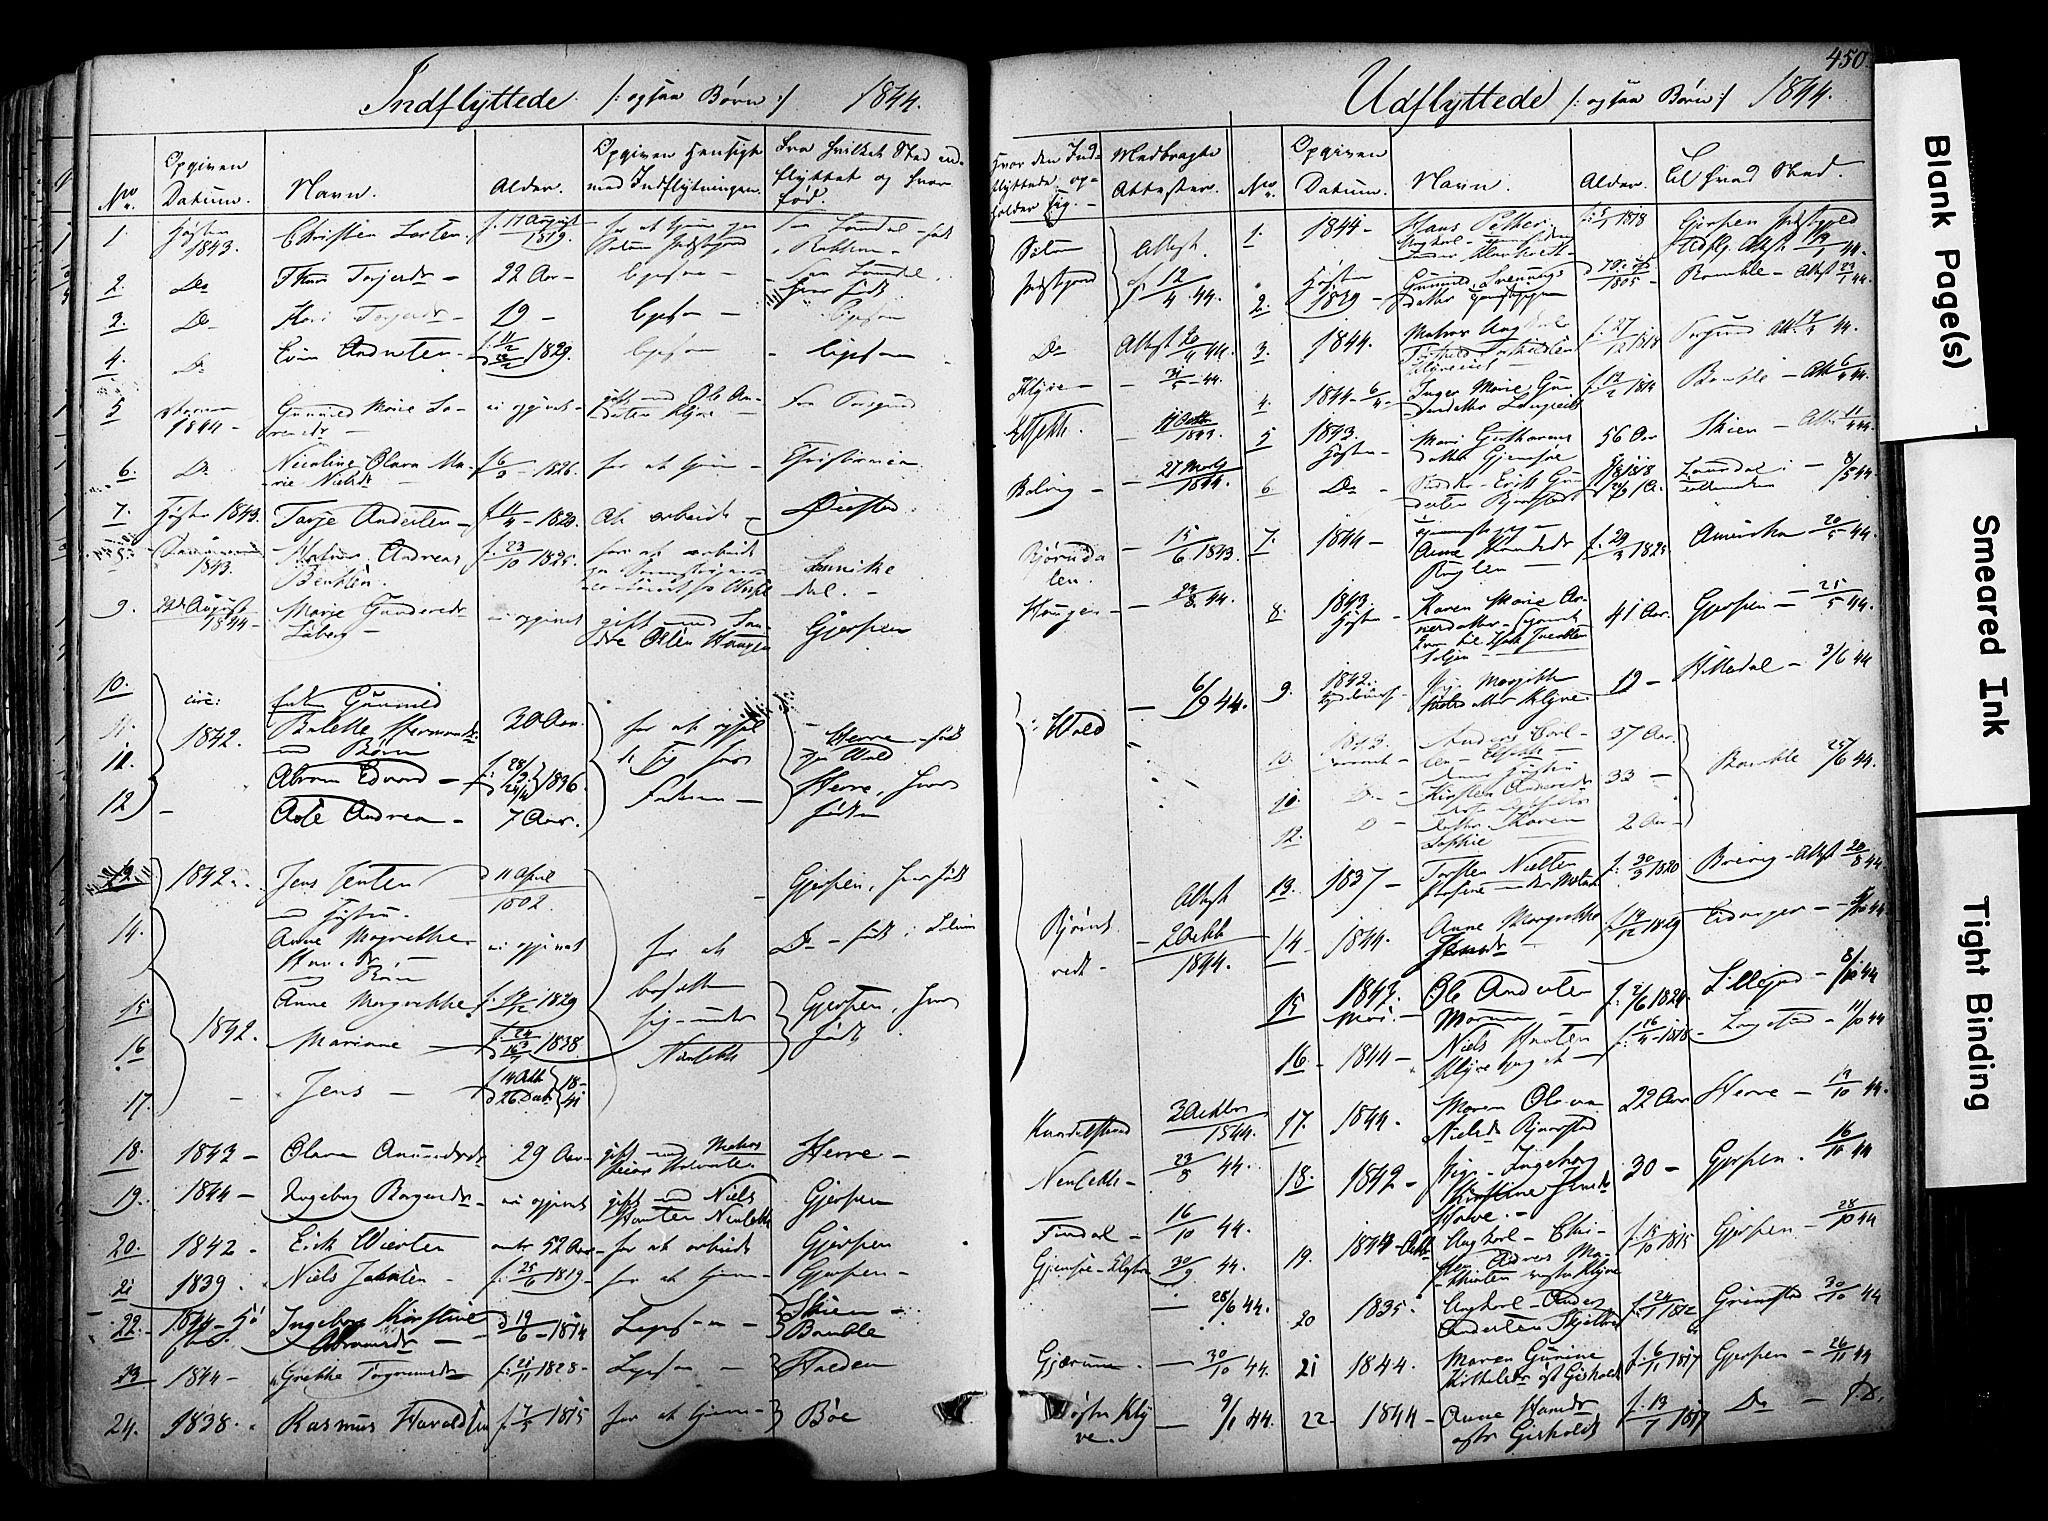 SAKO, Solum kirkebøker, F/Fa/L0006: Ministerialbok nr. I 6, 1844-1855, s. 450